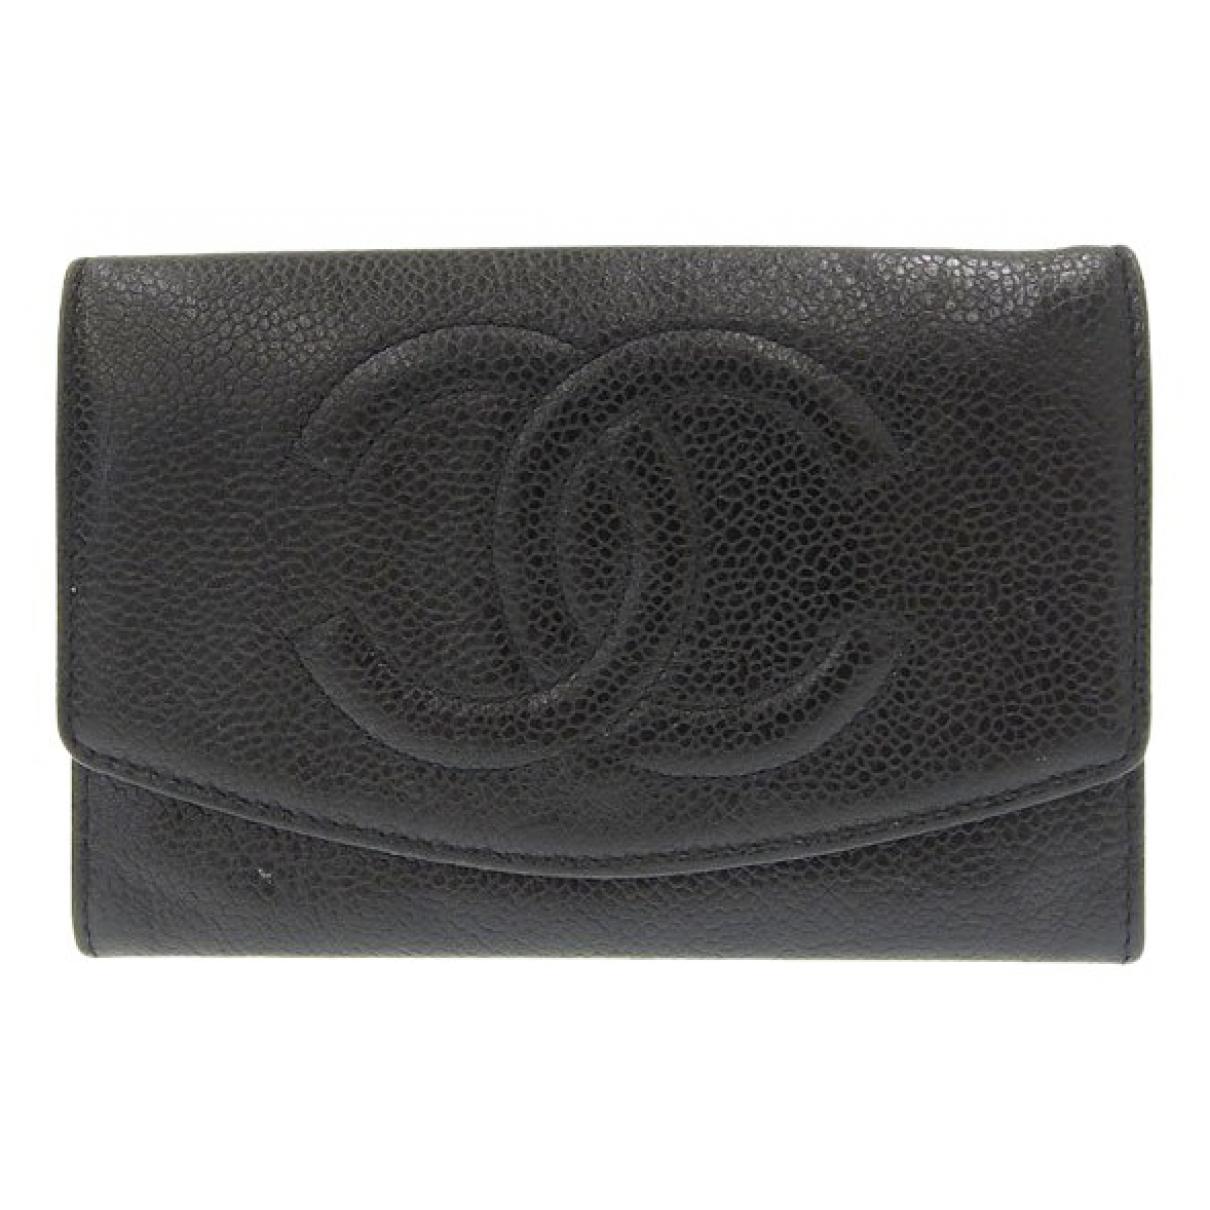 Chanel \N Portemonnaie in  Schwarz Leder